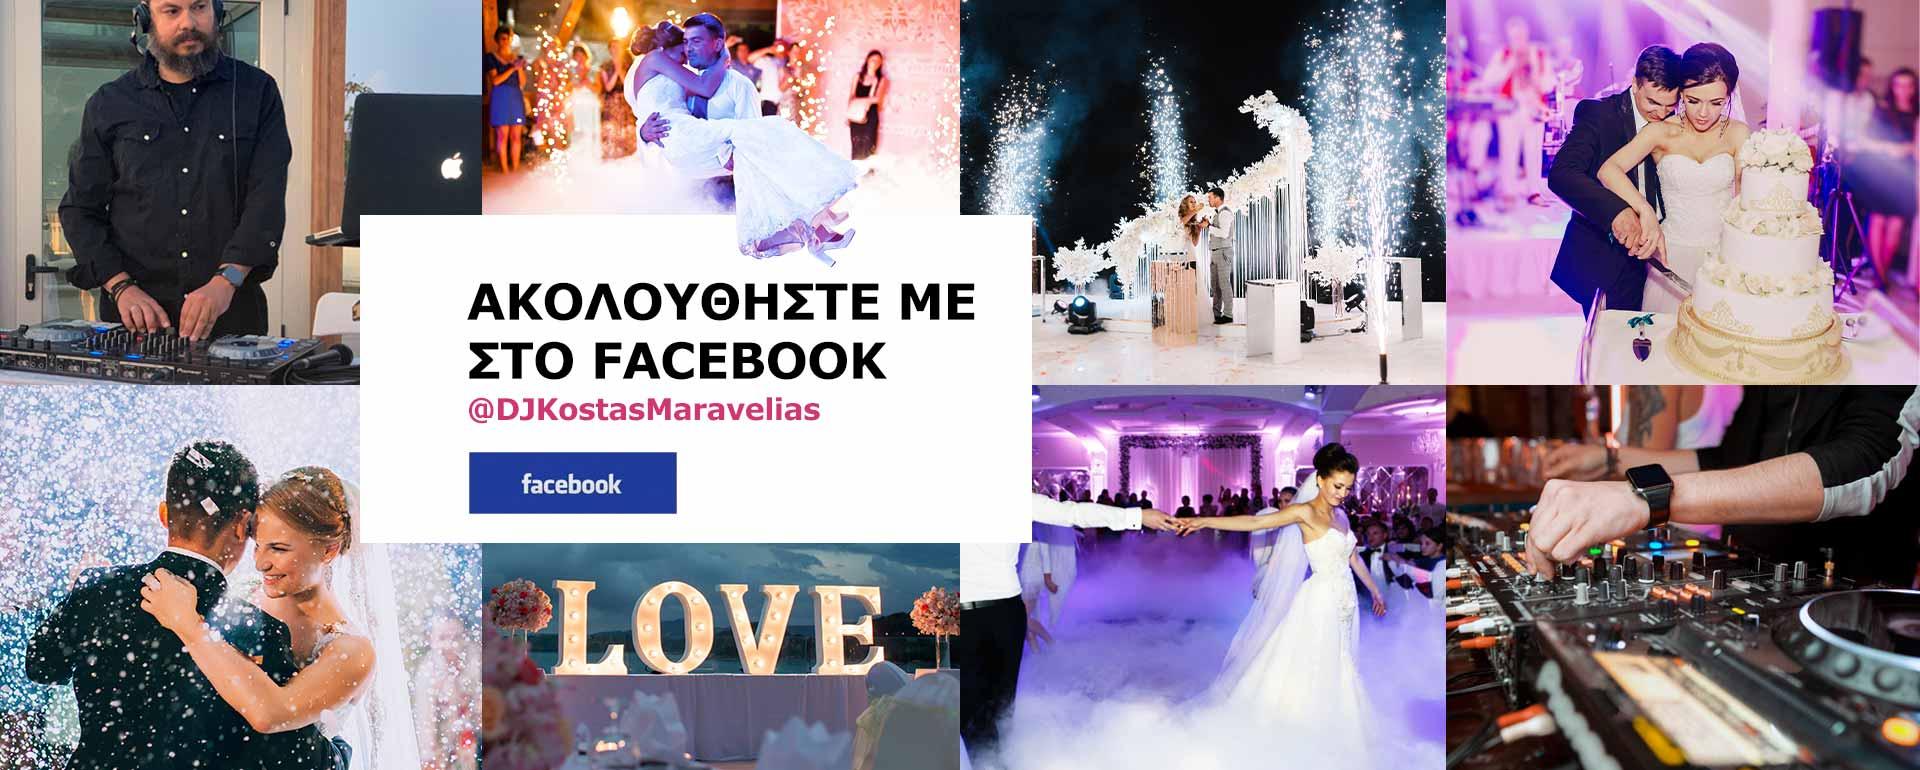 dj-rhodes-wedding-services-facebook--kostas-maravelias-greek